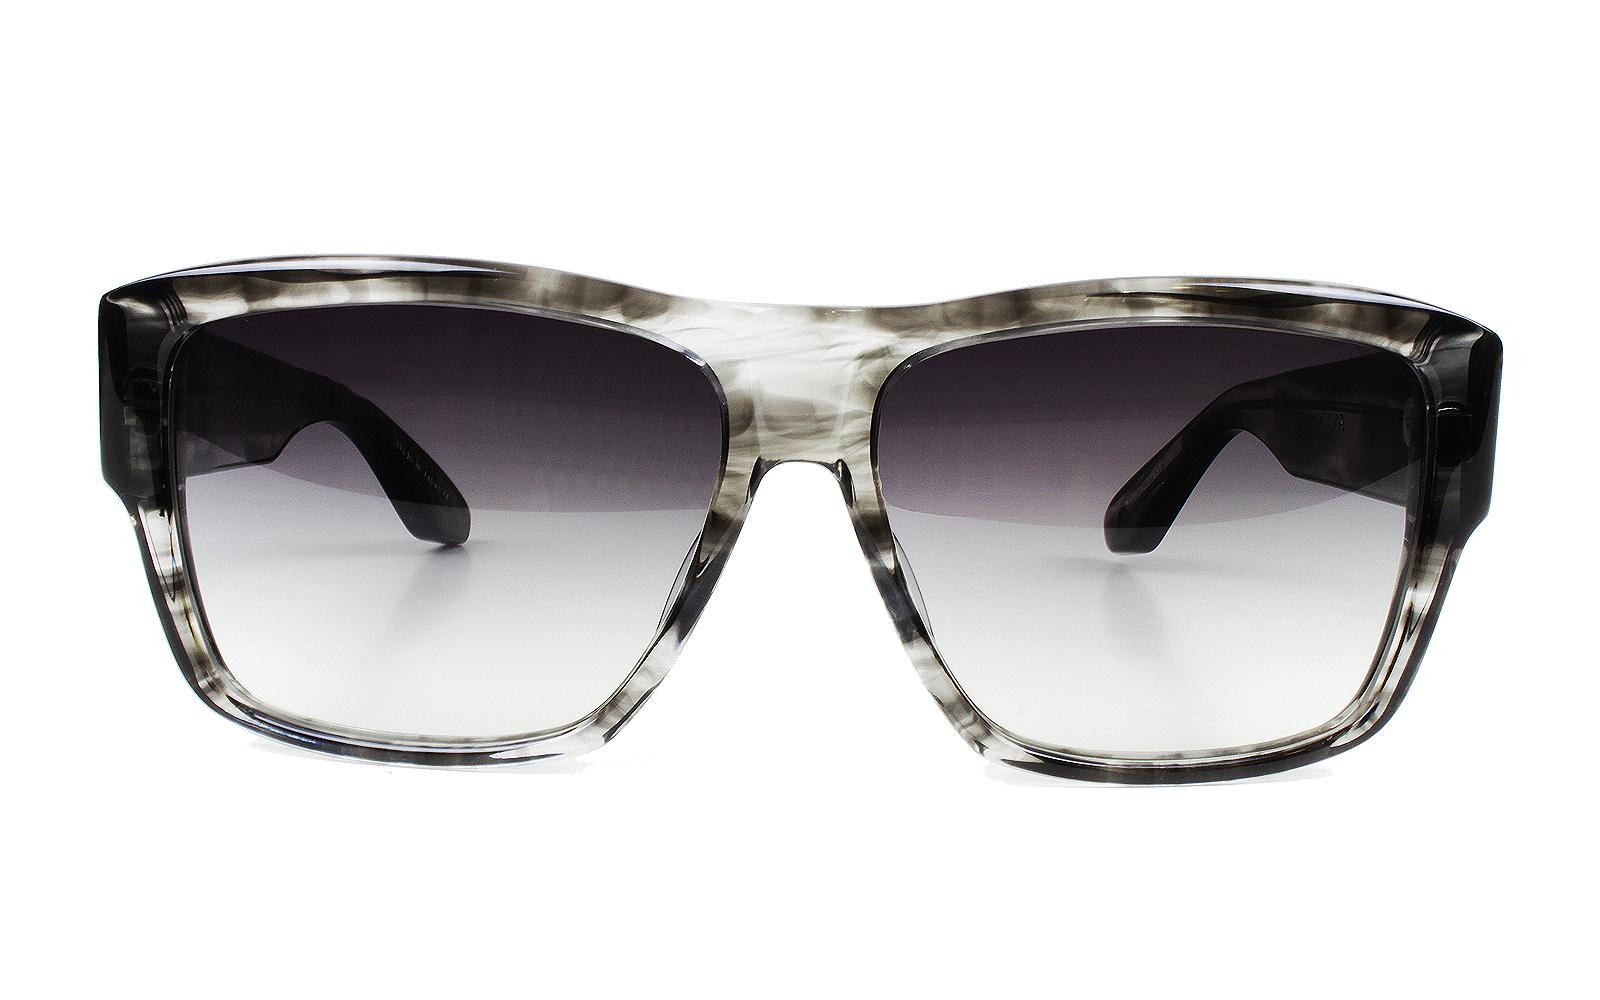 ecd5786dff5 Dita Insider DRX-2003E  sunglasses - Shop from the brilliant selection of  sunglasses made by SUNGLASSCURATOR.com